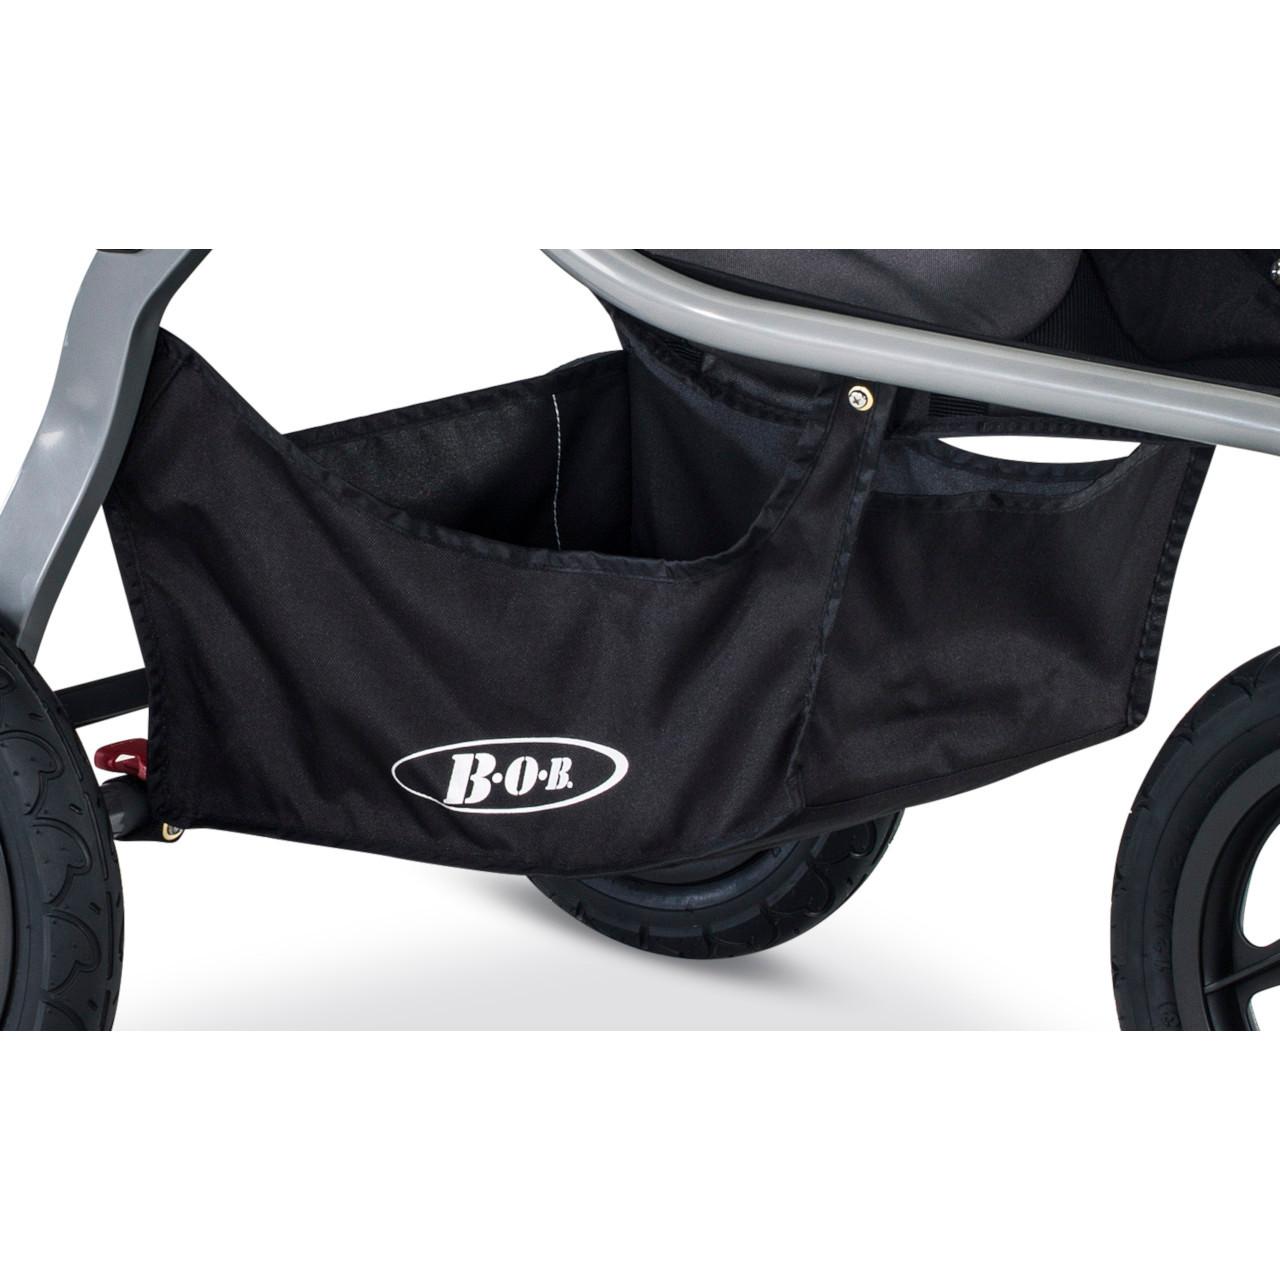 Snack Tray for BOB Single Stroller SN1001 Brand NEW!